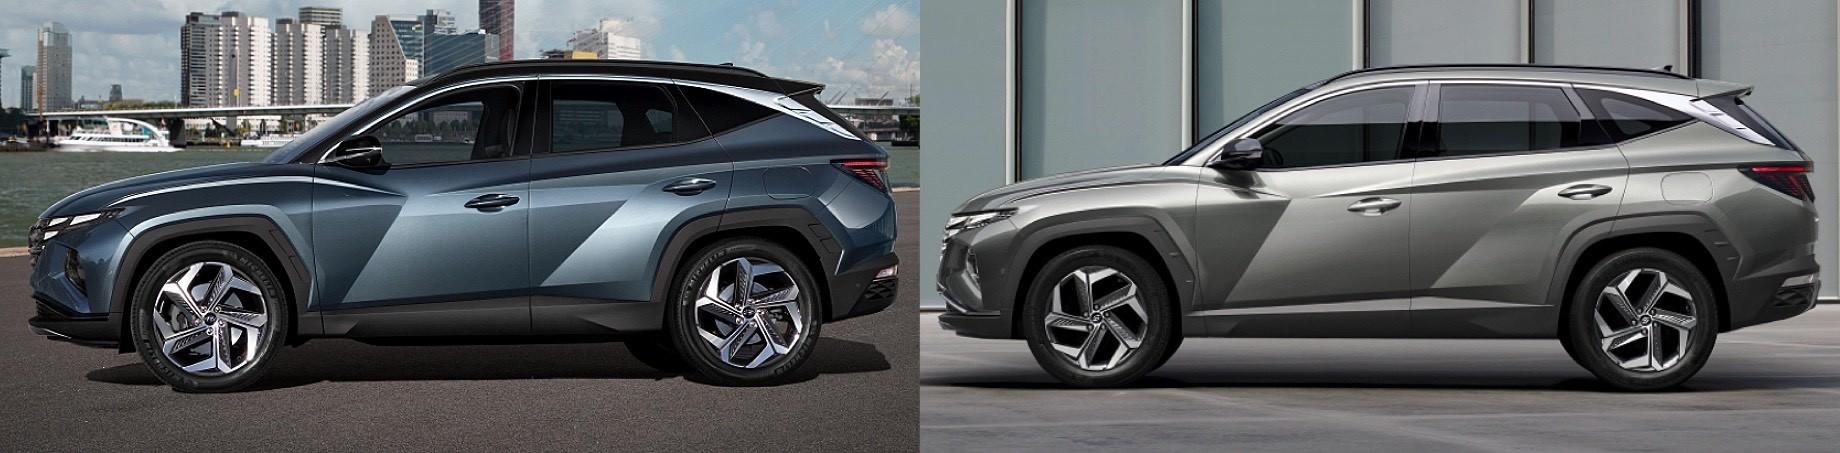 Hyundai Tucson прибавил вгабаритах итехнологичности